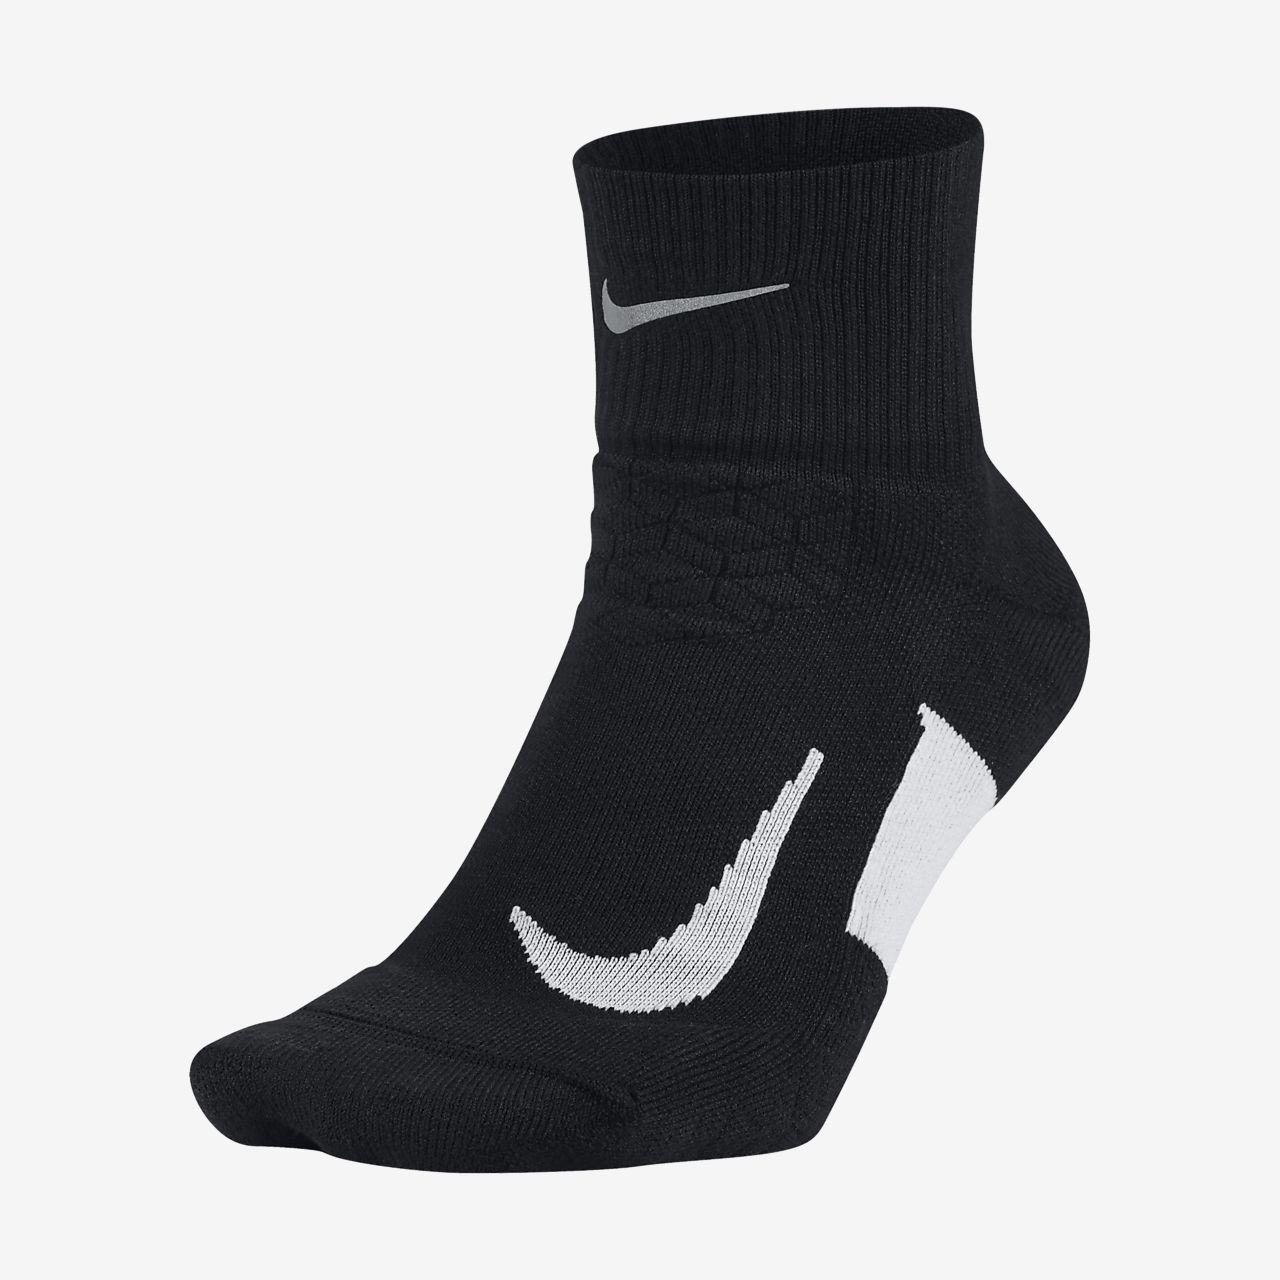 ecb1b060c Nike Elite Cushion Quarter Running Socks. Nike.com AU